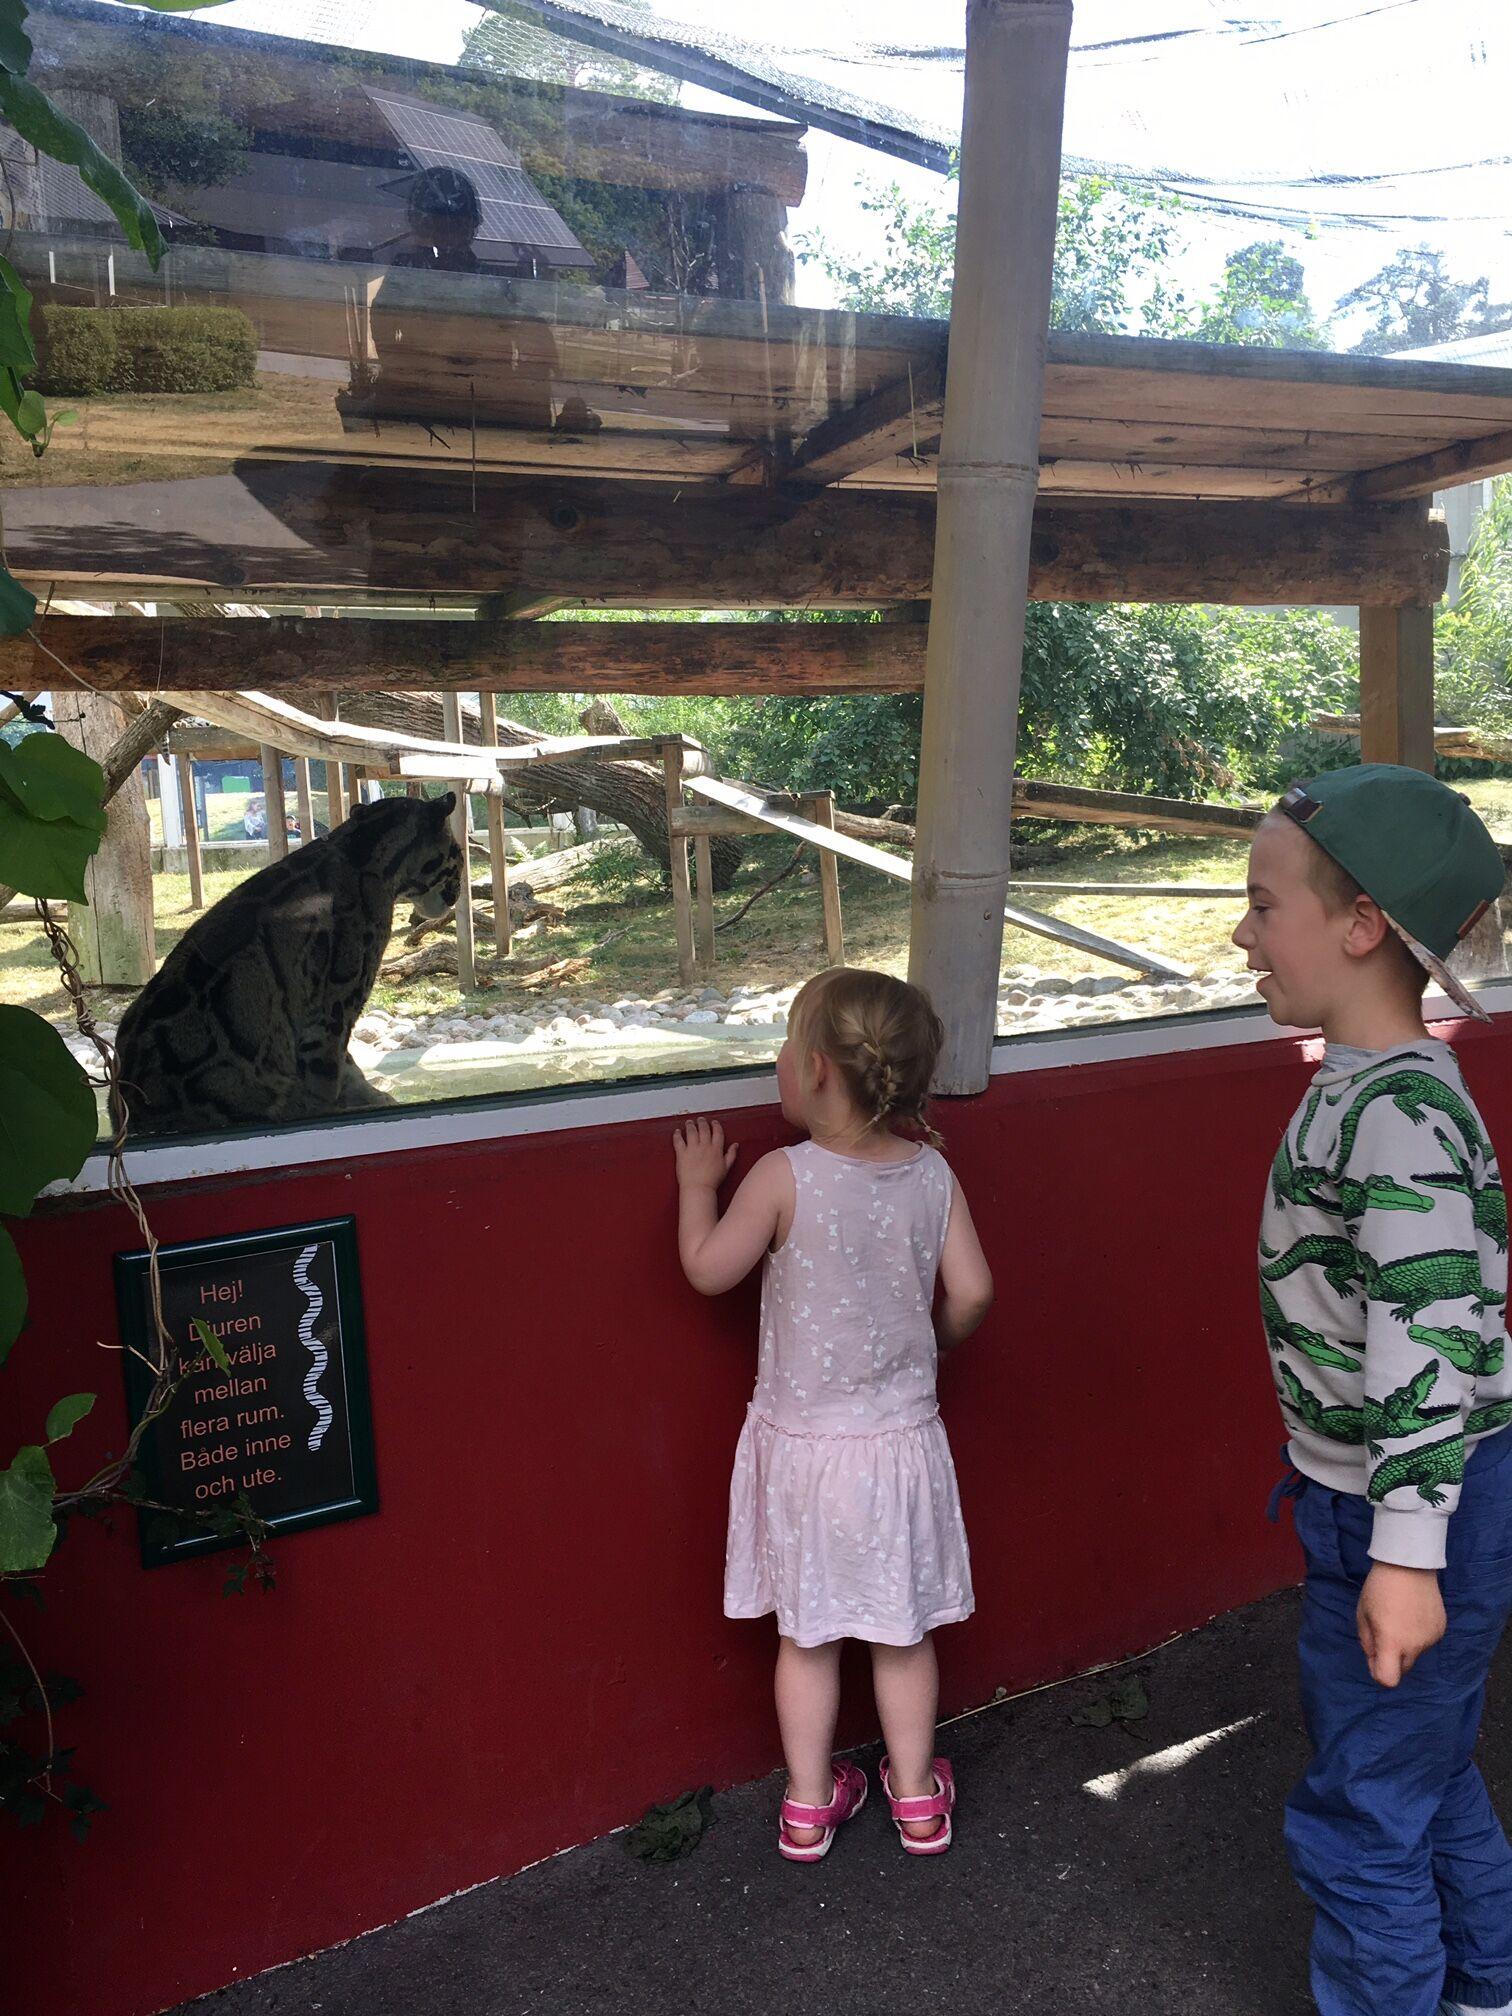 Parken-zoo-katt